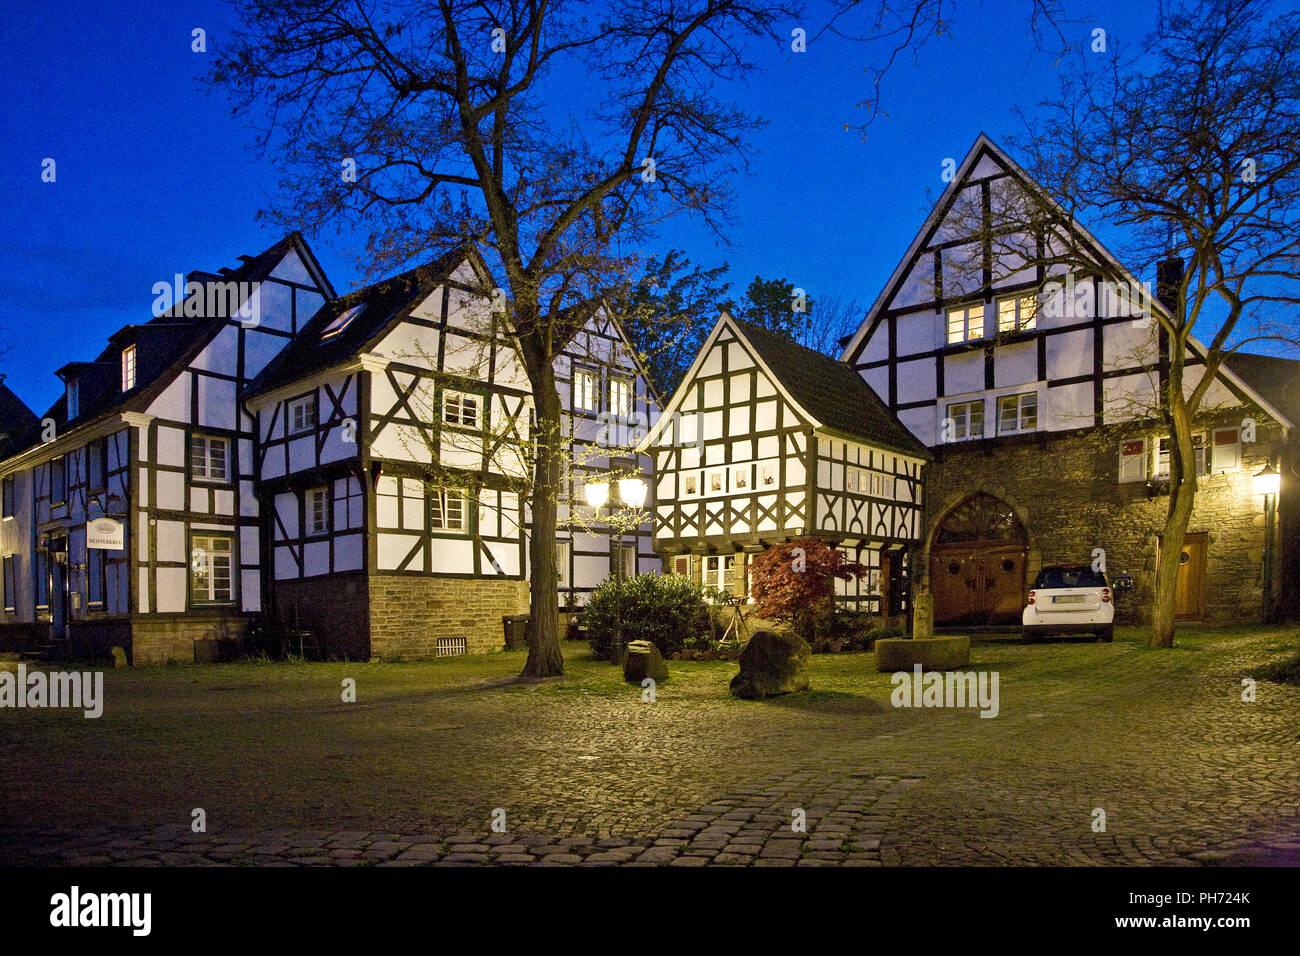 Five gable corner, Freiheit, Alt Wetter, Germany. - Stock Image